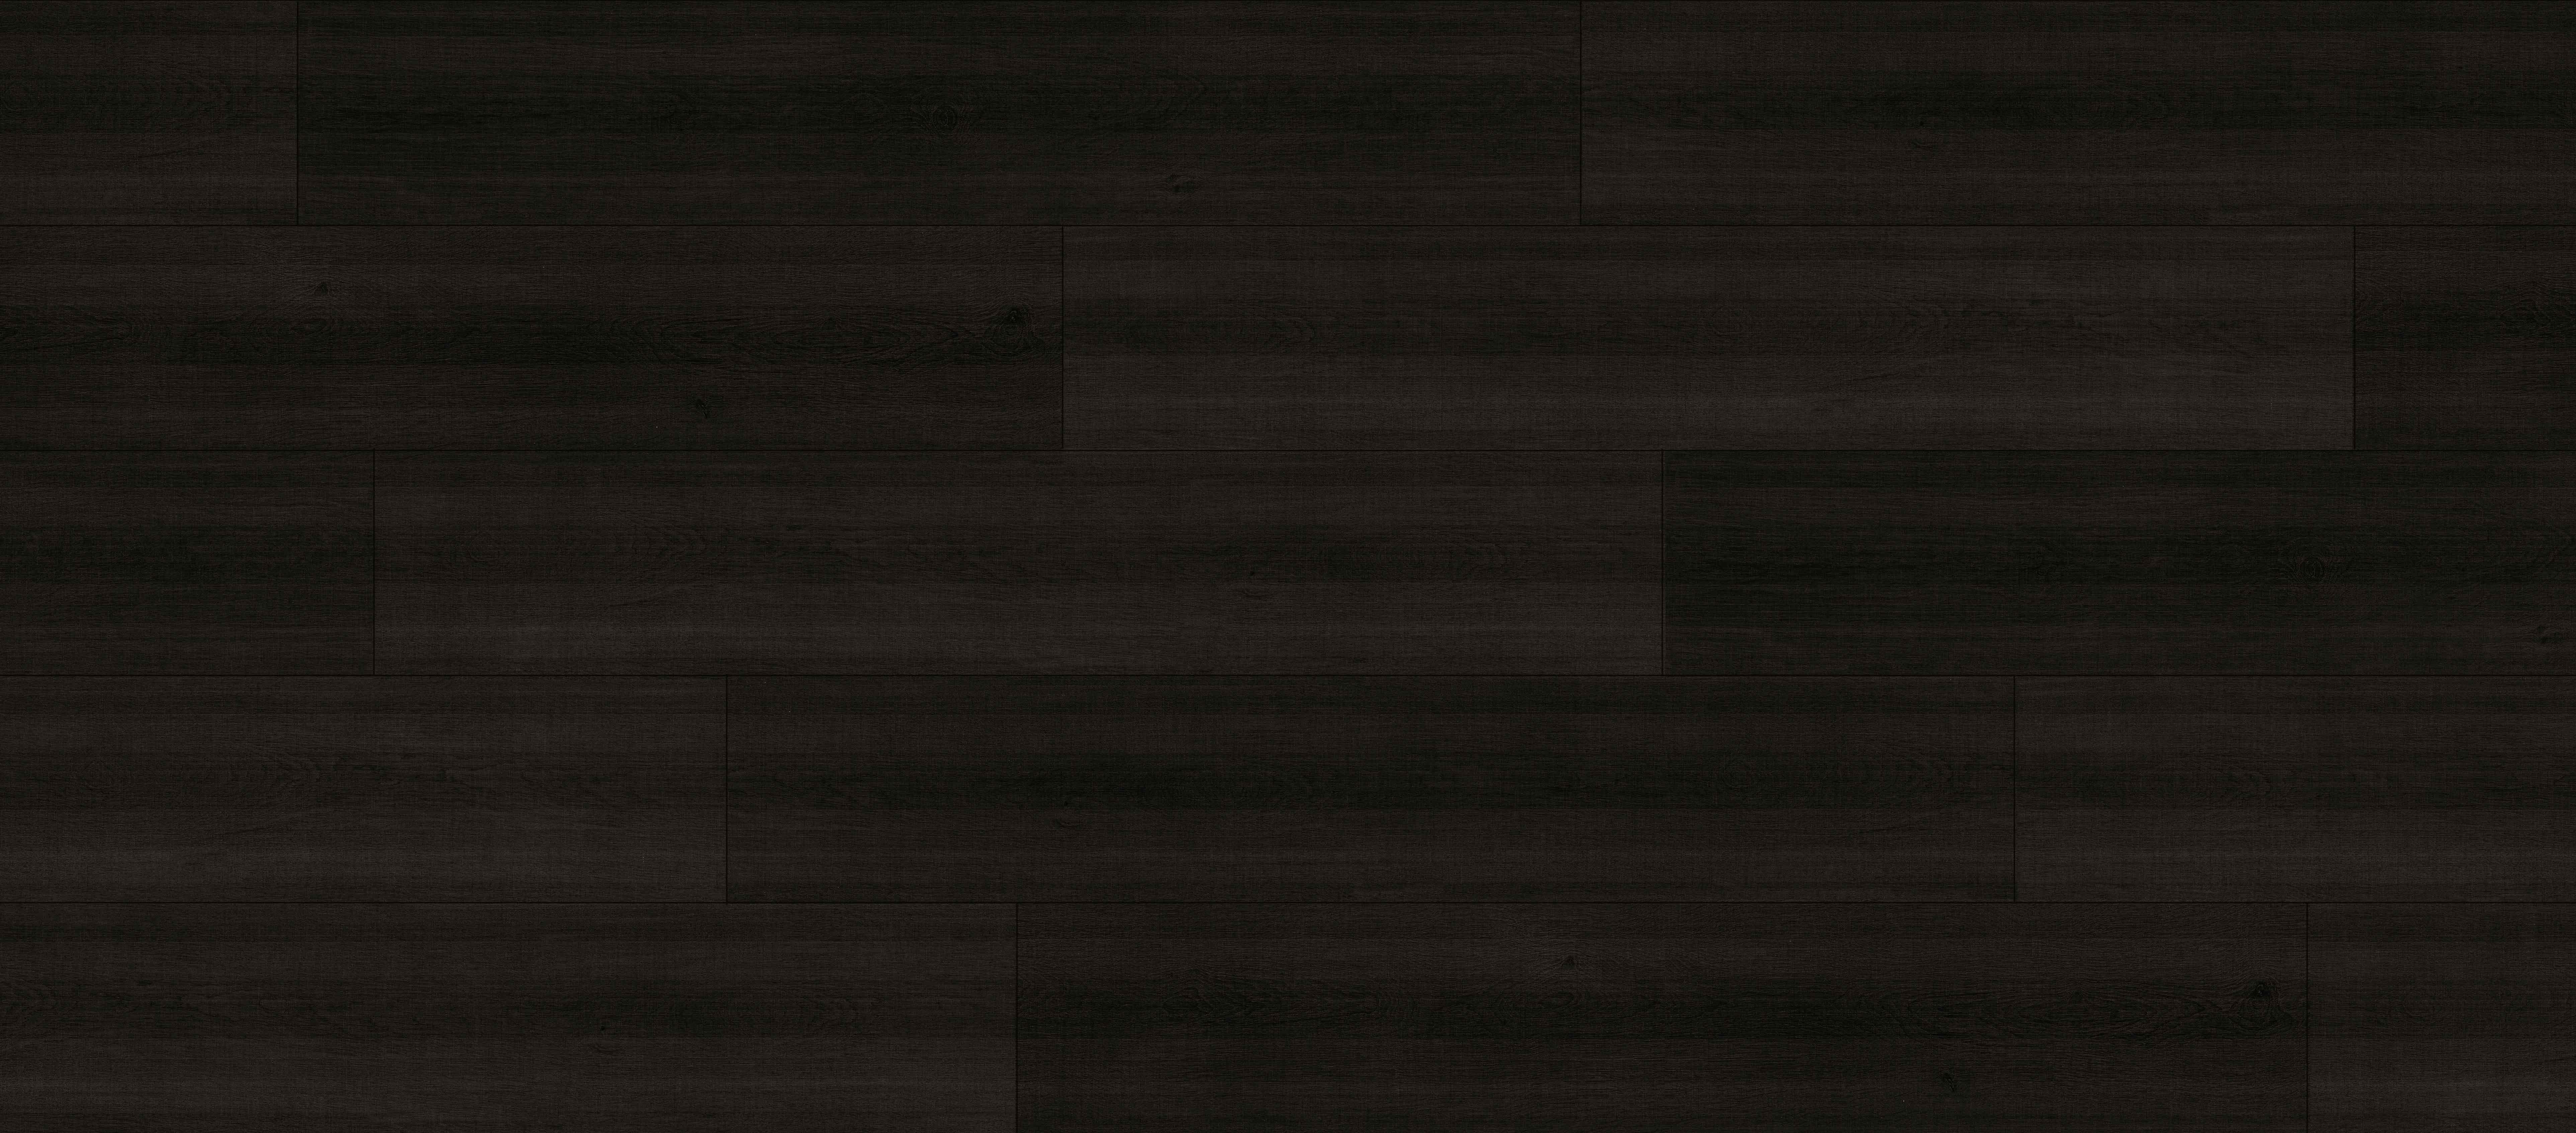 HYB-91209 Charcoal Topview L